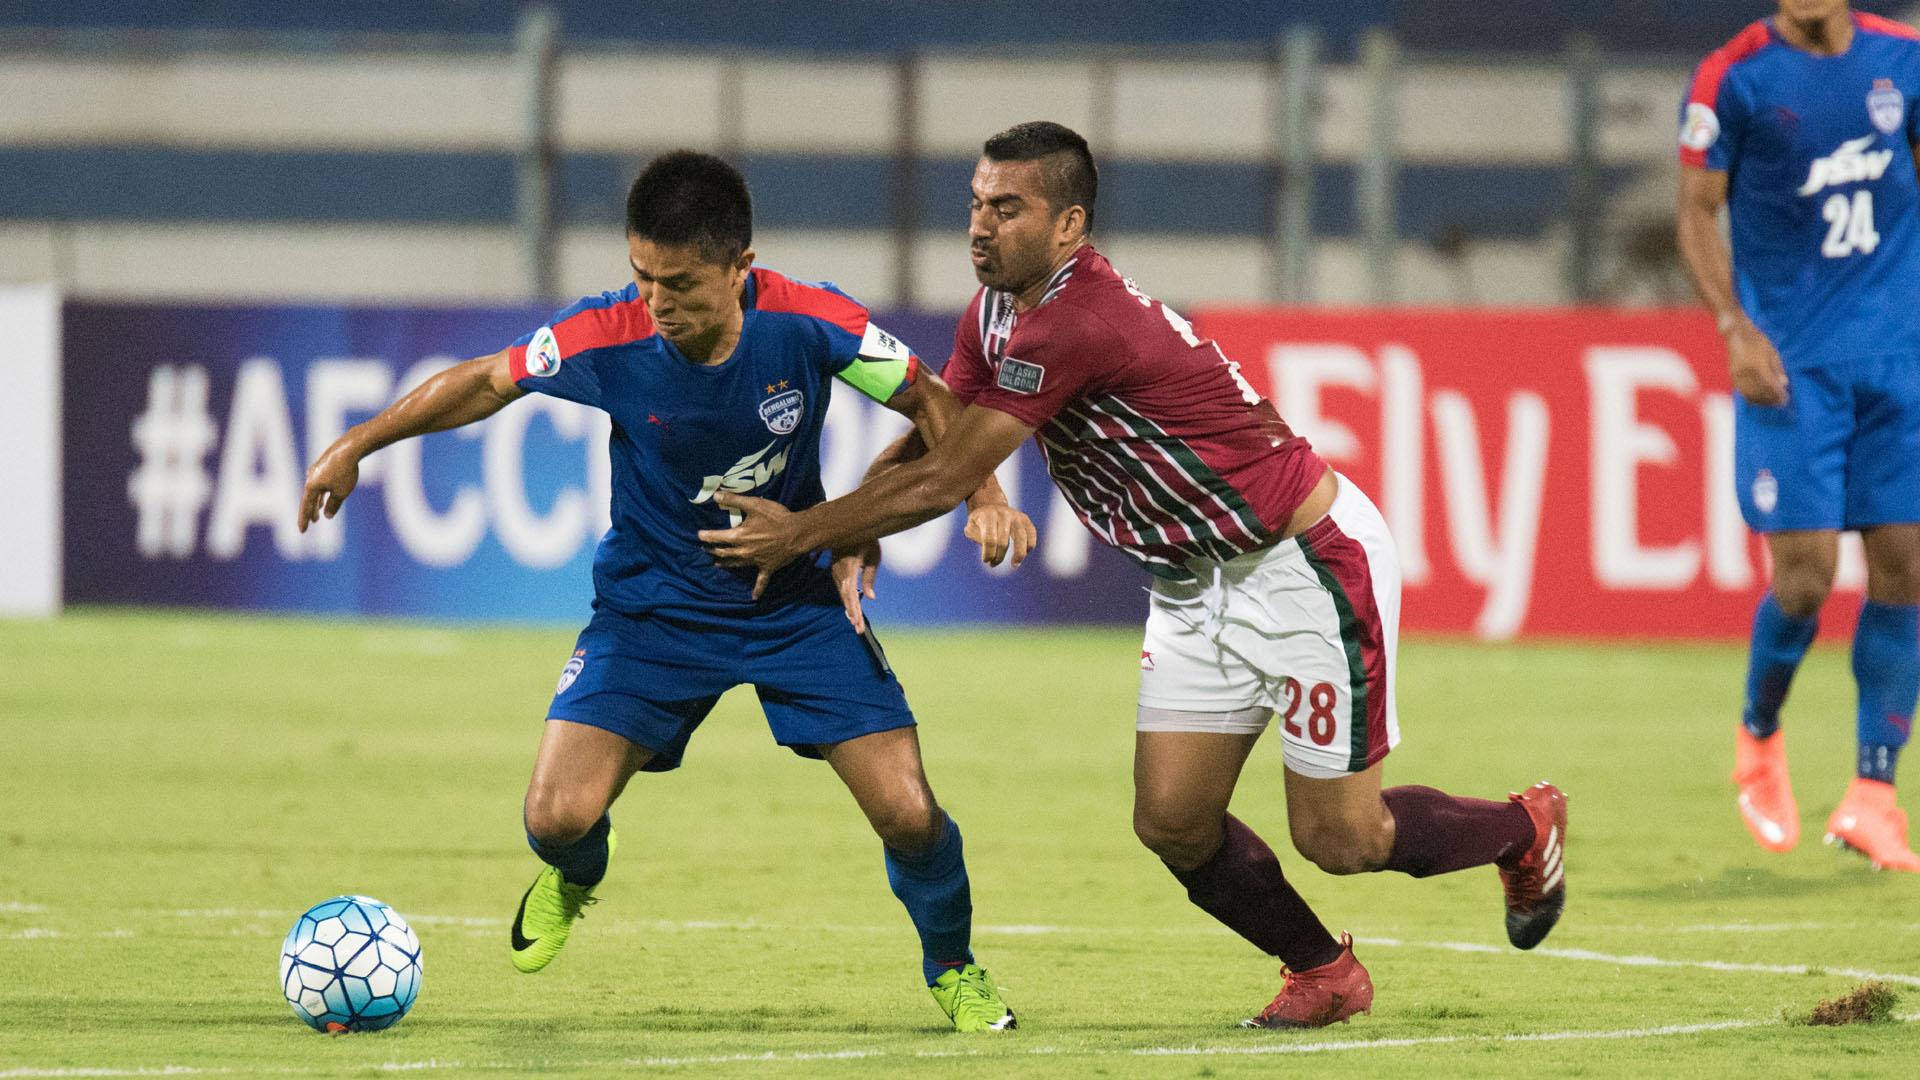 Sunil Chhetri Sehnaj Singh Bengaluru FC Mohun Bagan AFC Cup 2017